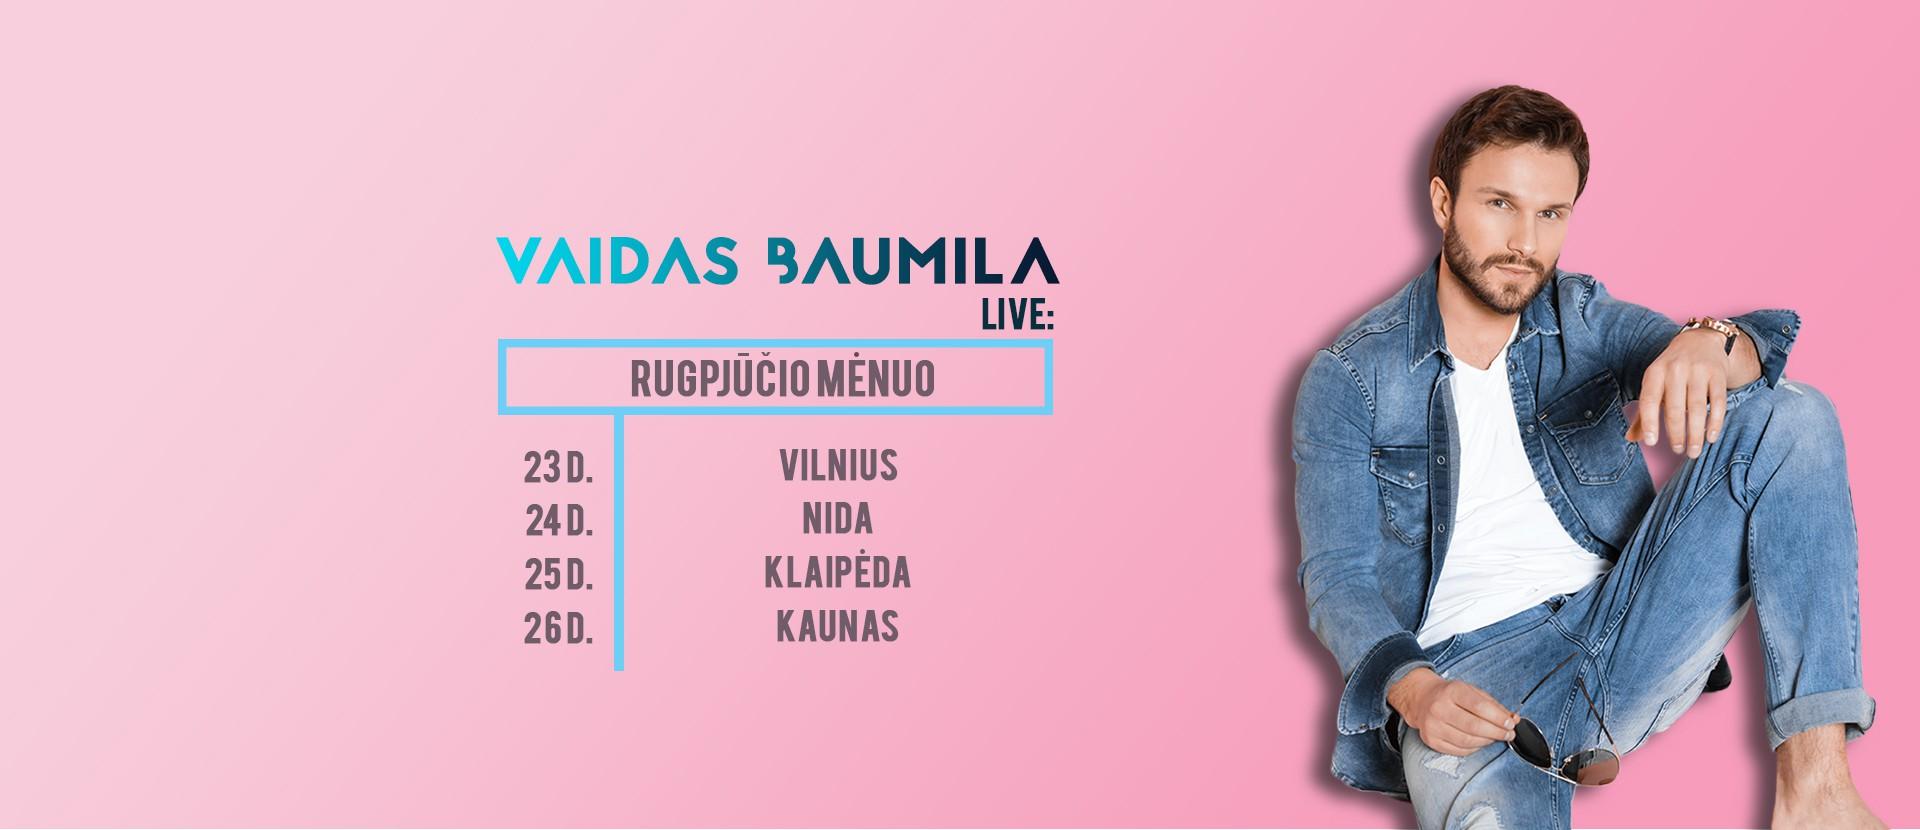 Vaidas Baumila live